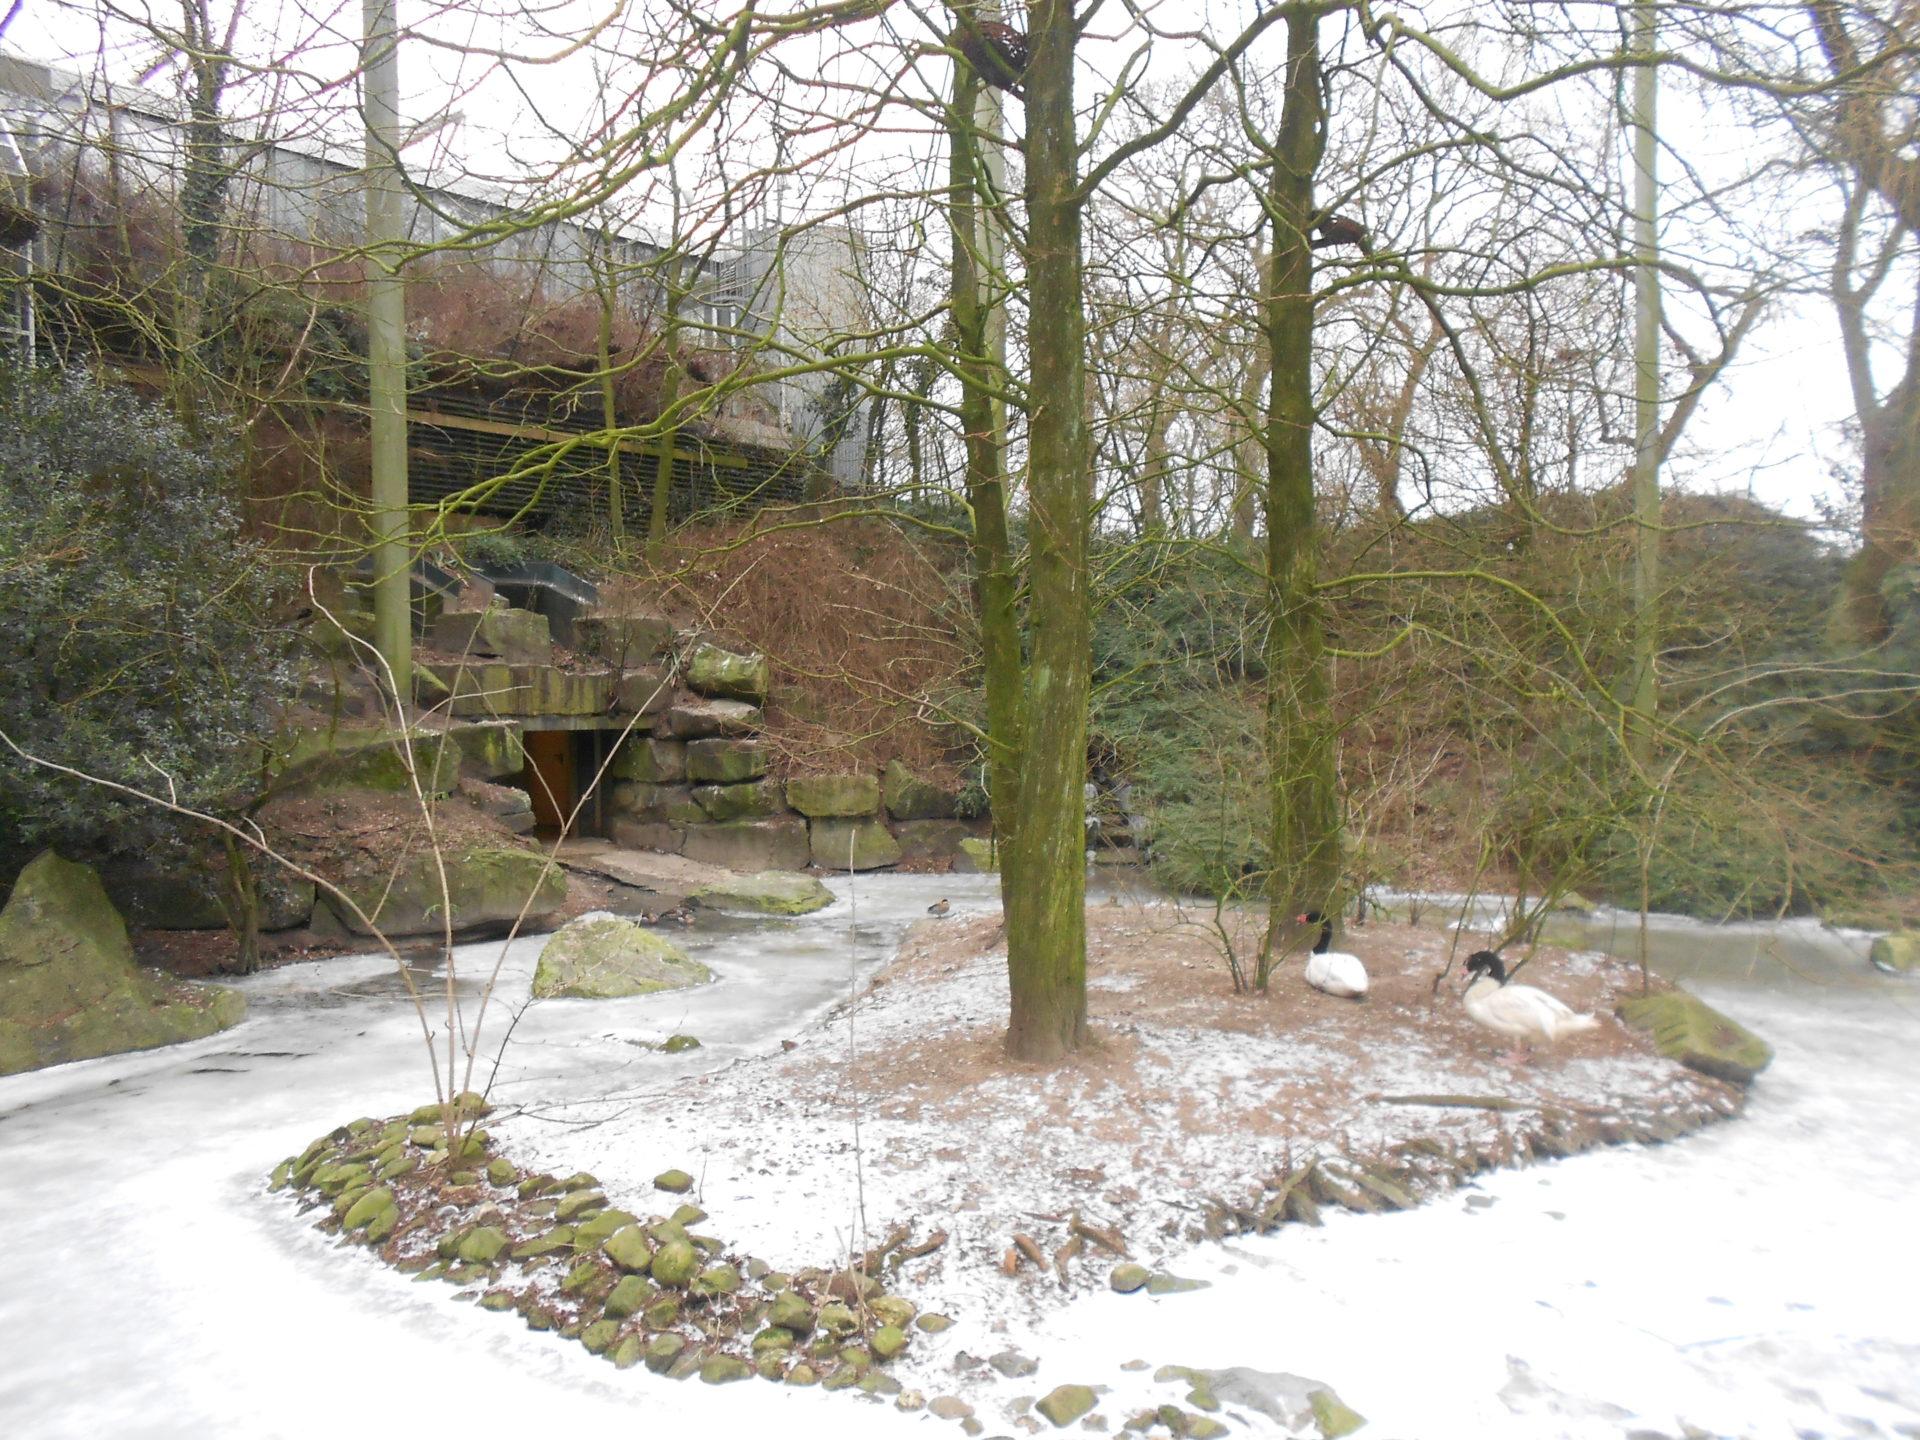 Dierenpark Emmen - American Free-flight aviary (9)